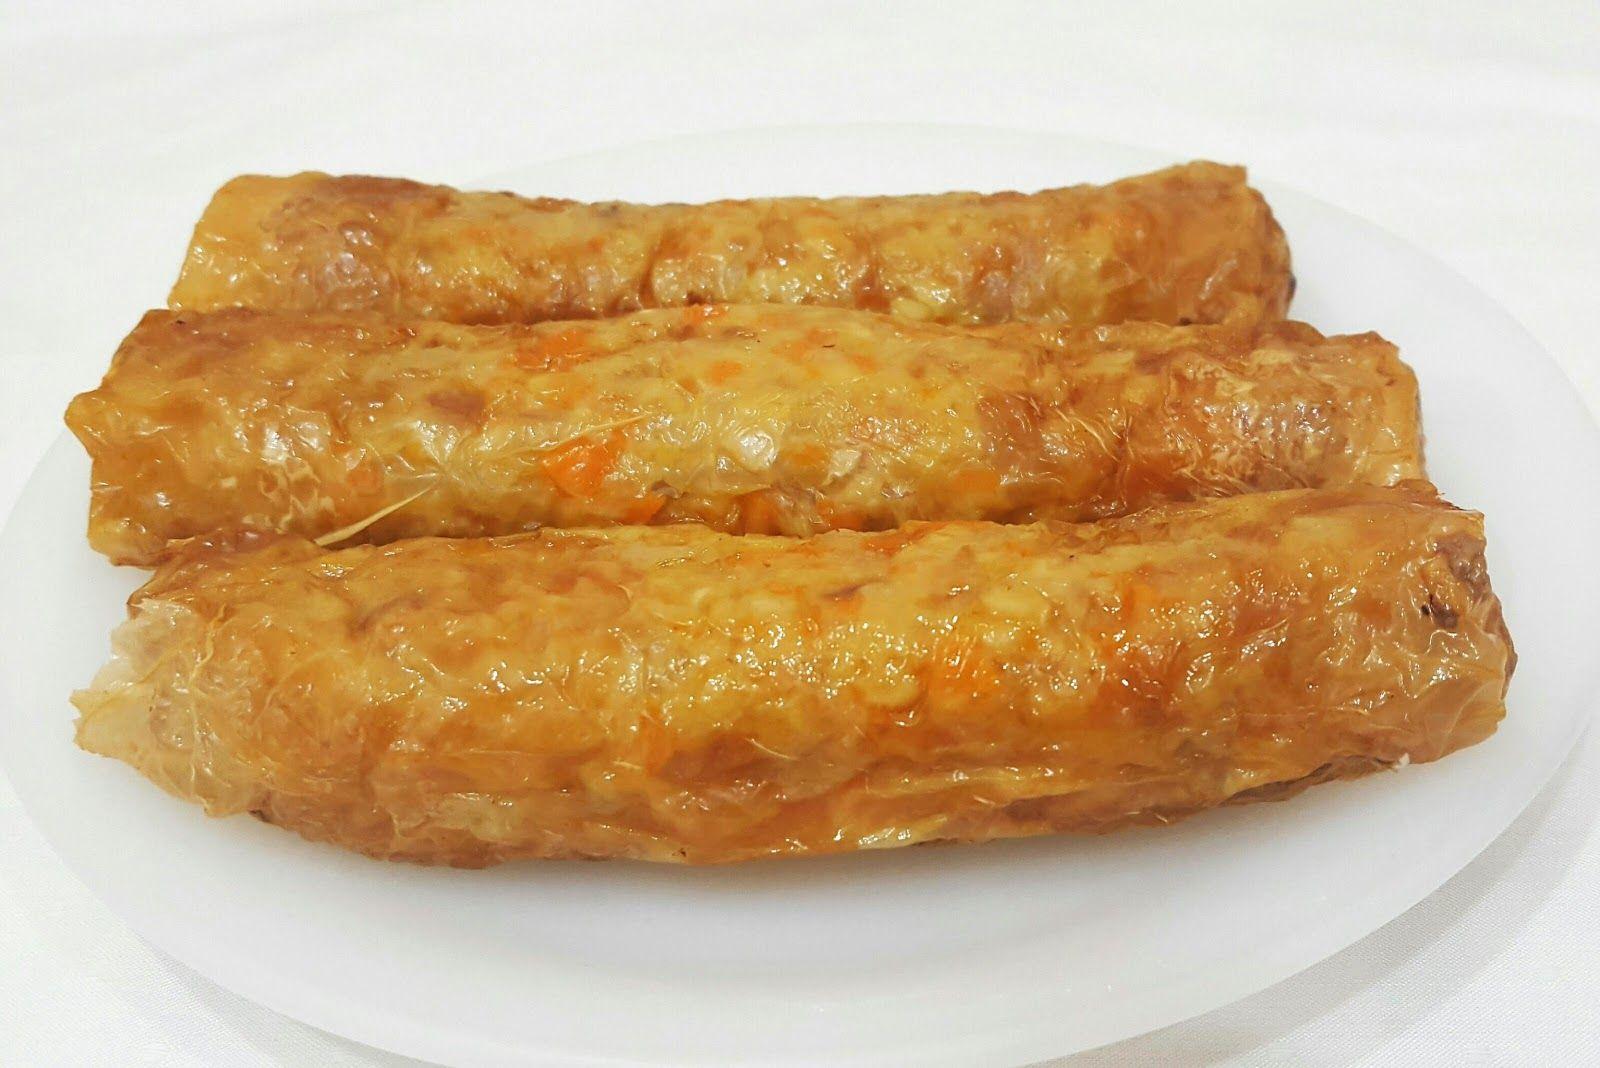 Minced Pork Rolls (Ngoh Hiang/ Loh Bak) Using Airfryer